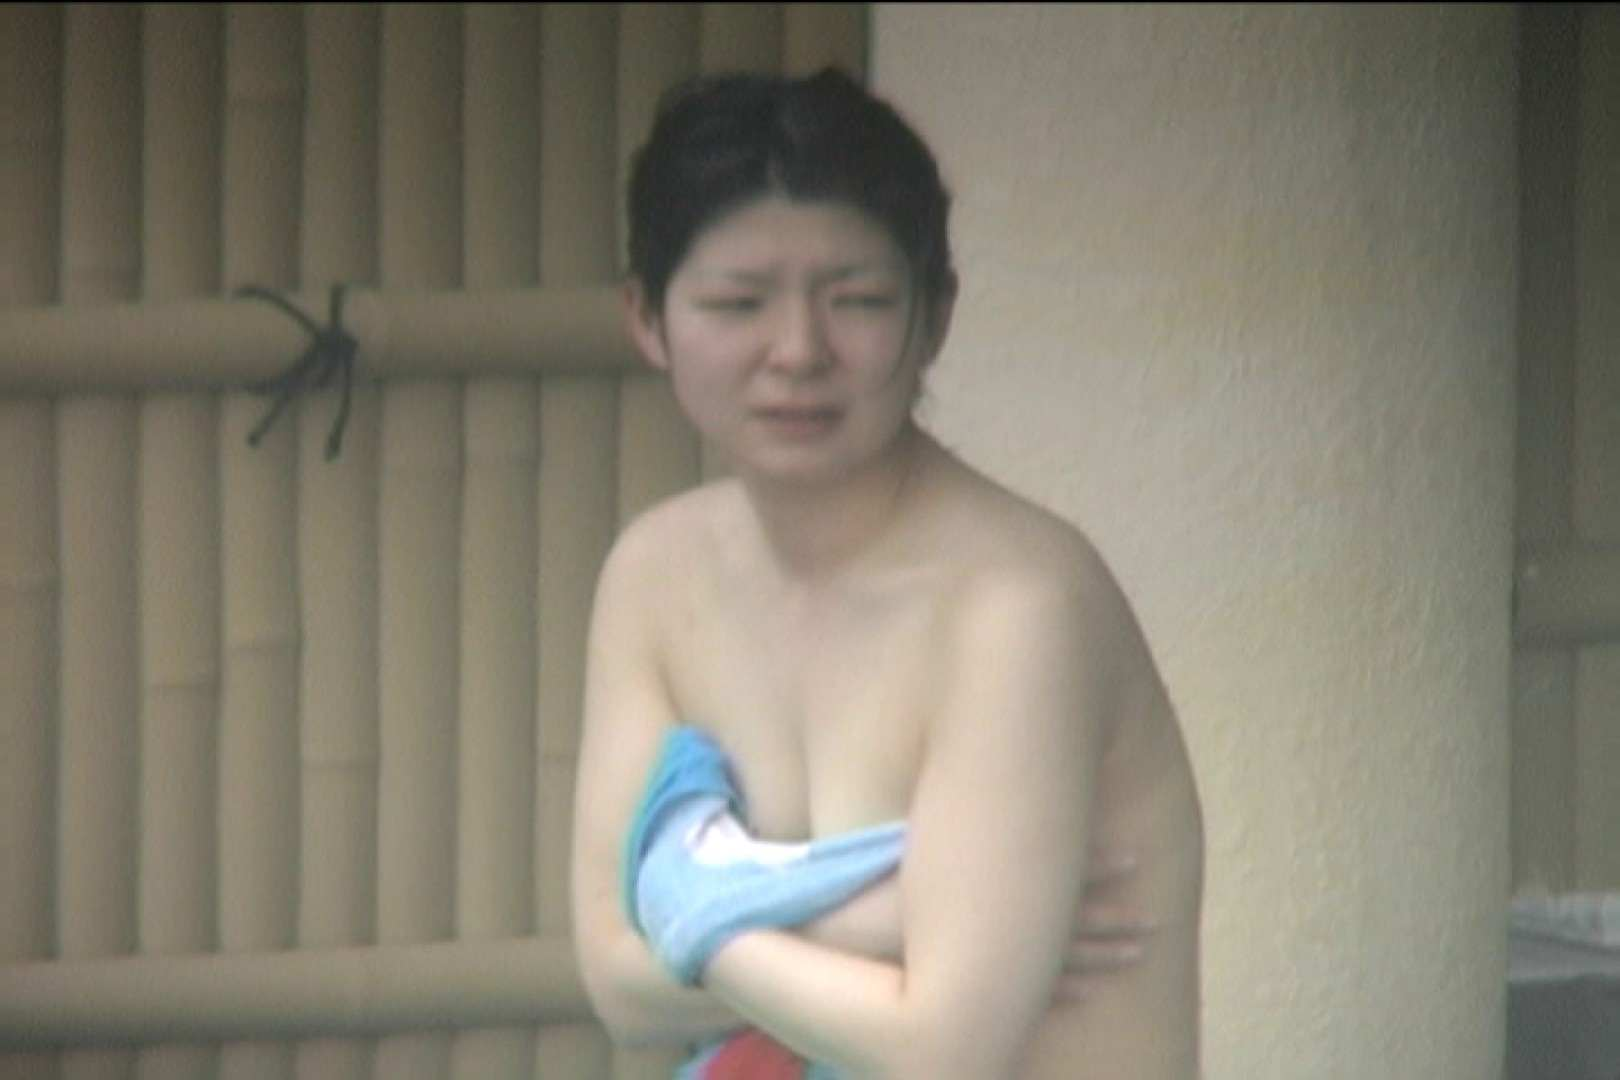 Aquaな露天風呂Vol.139 盗撮 | HなOL  53pic 22